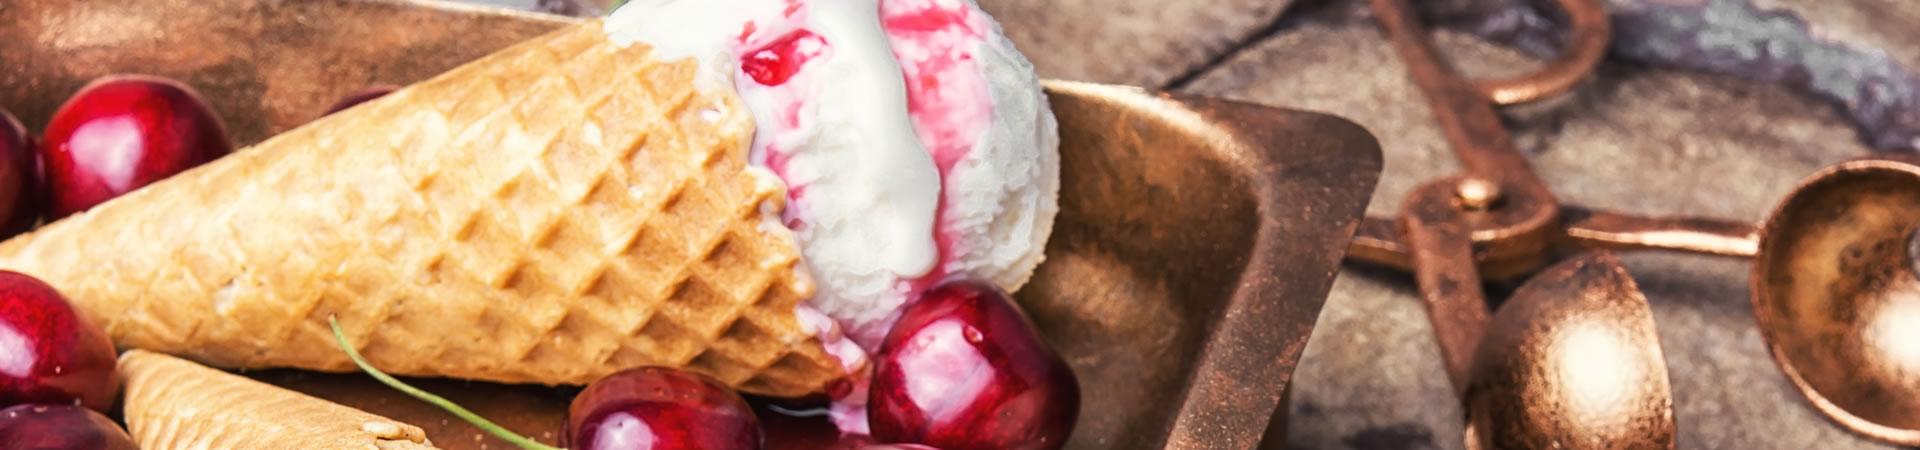 Ice Cream Parlour Insurance